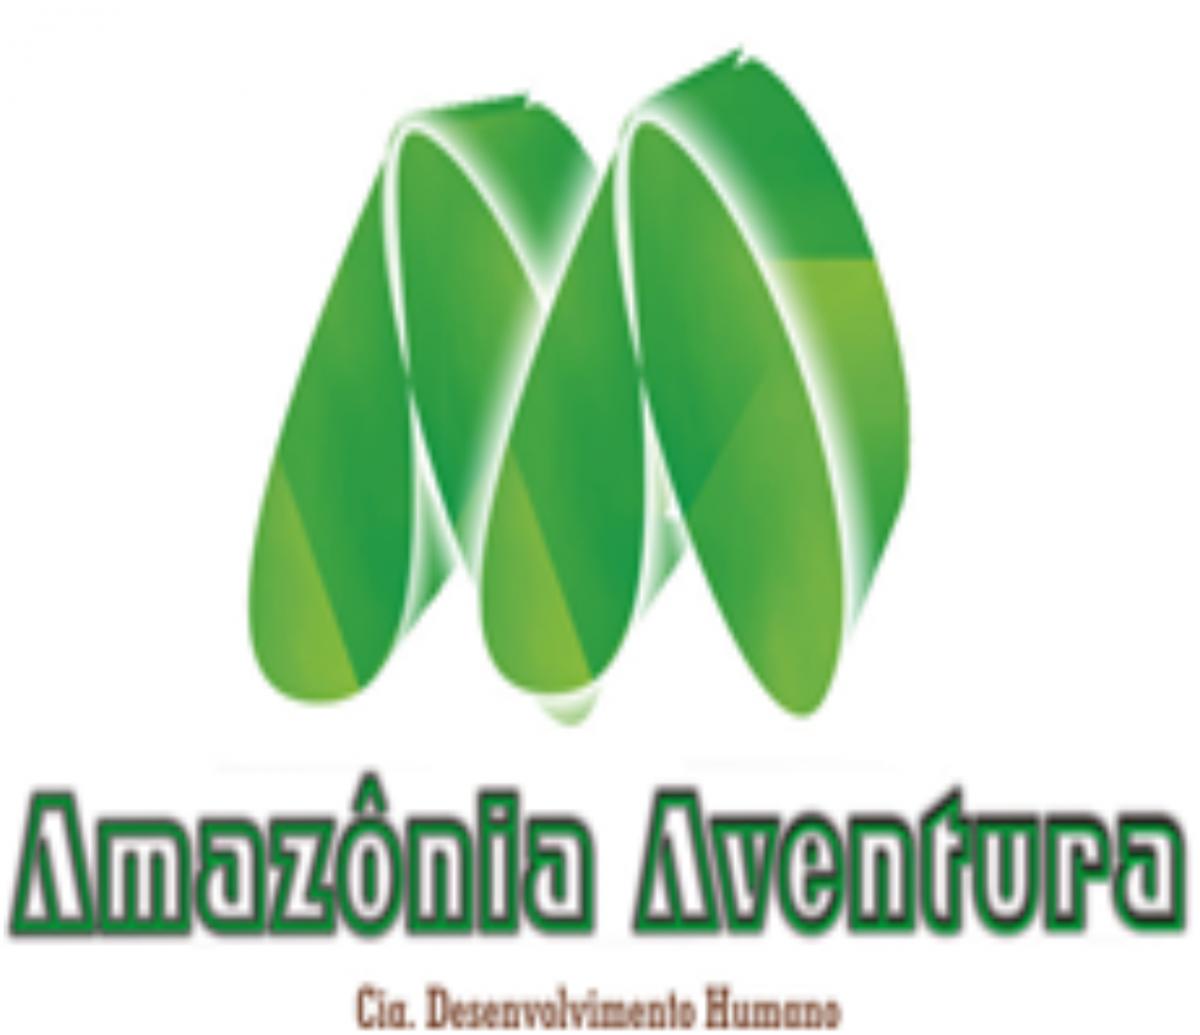 Amazônia Aventura